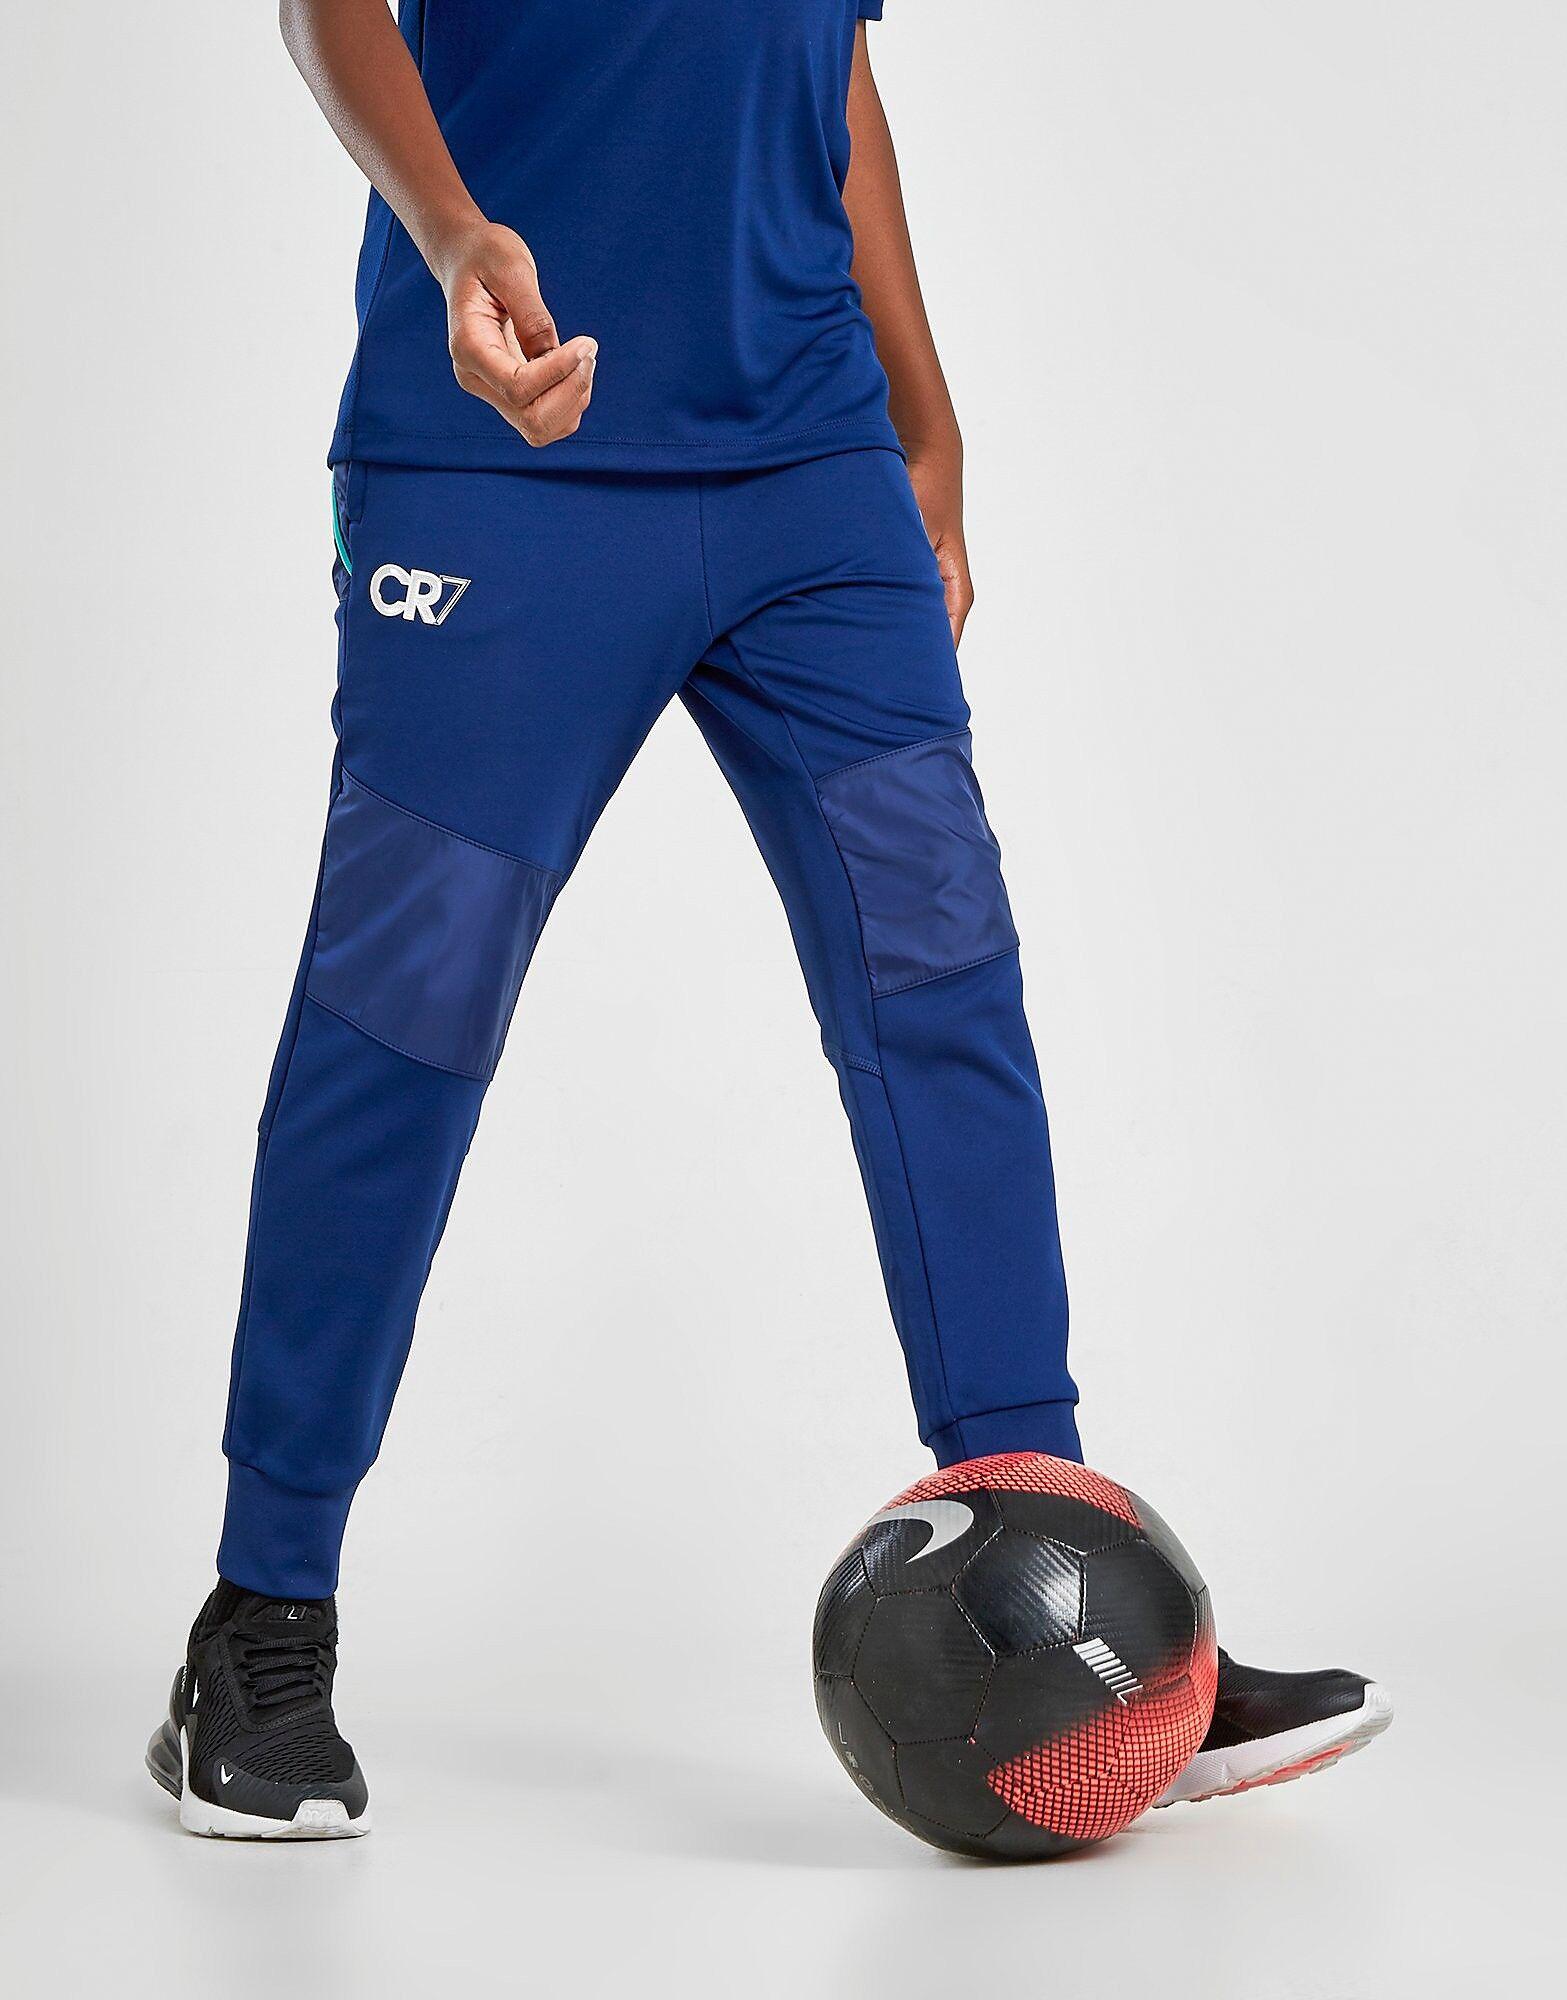 Image of Nike CR7 Verryttelyhousut Juniorit - Kids, Sininen